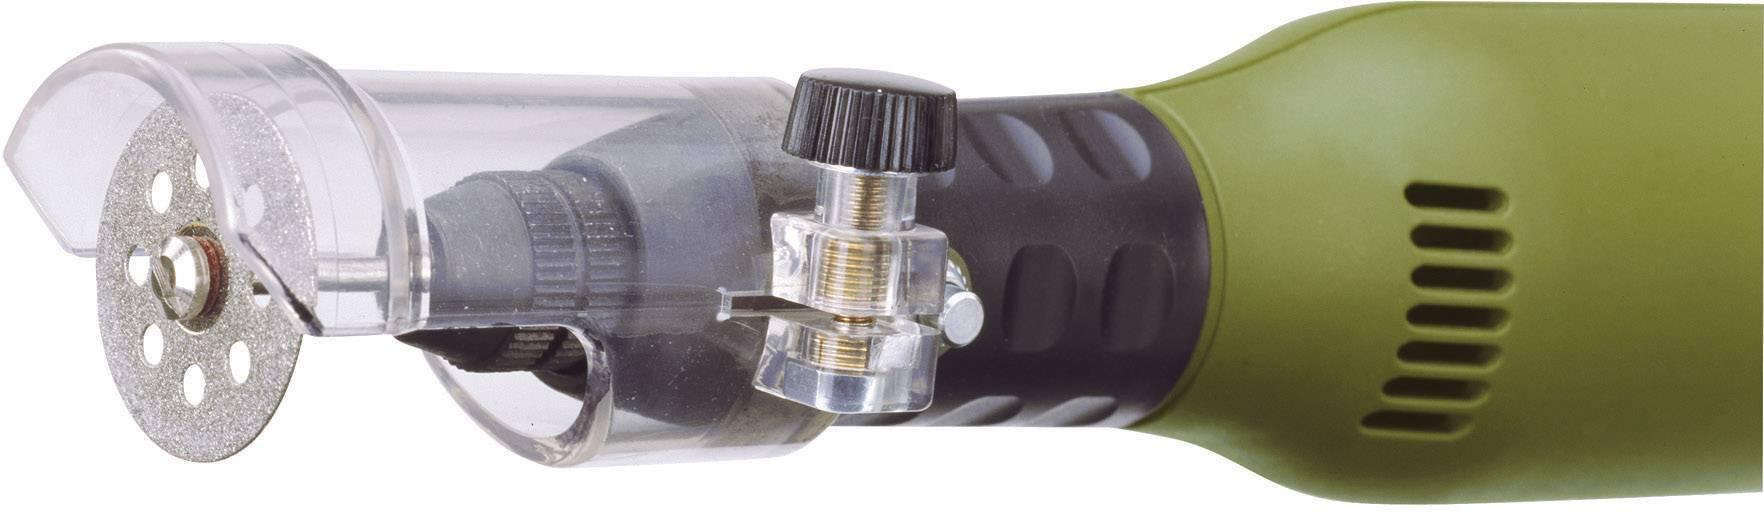 Kryt na ručné náradie Proxxon MICROMOT 8944